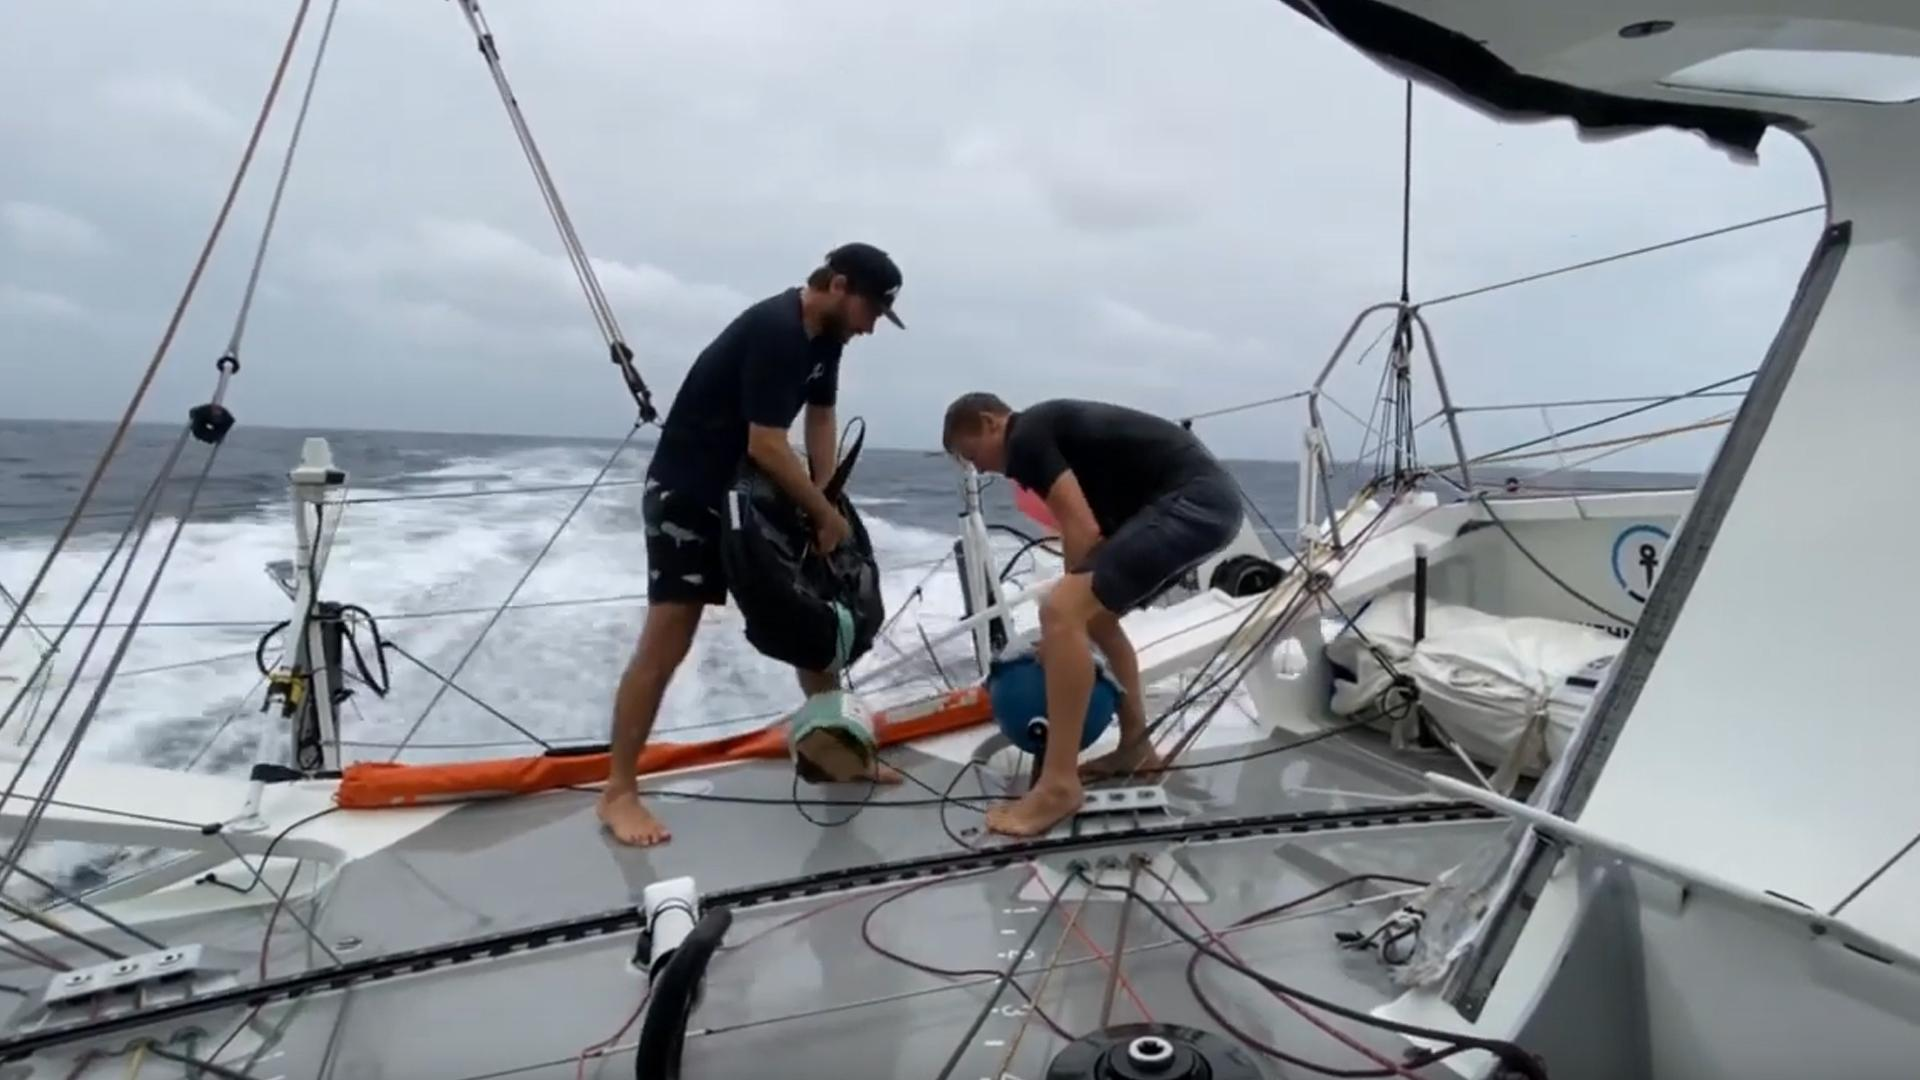 Sailors drop off ocean-monitoring buoys during trans-Atlantic race